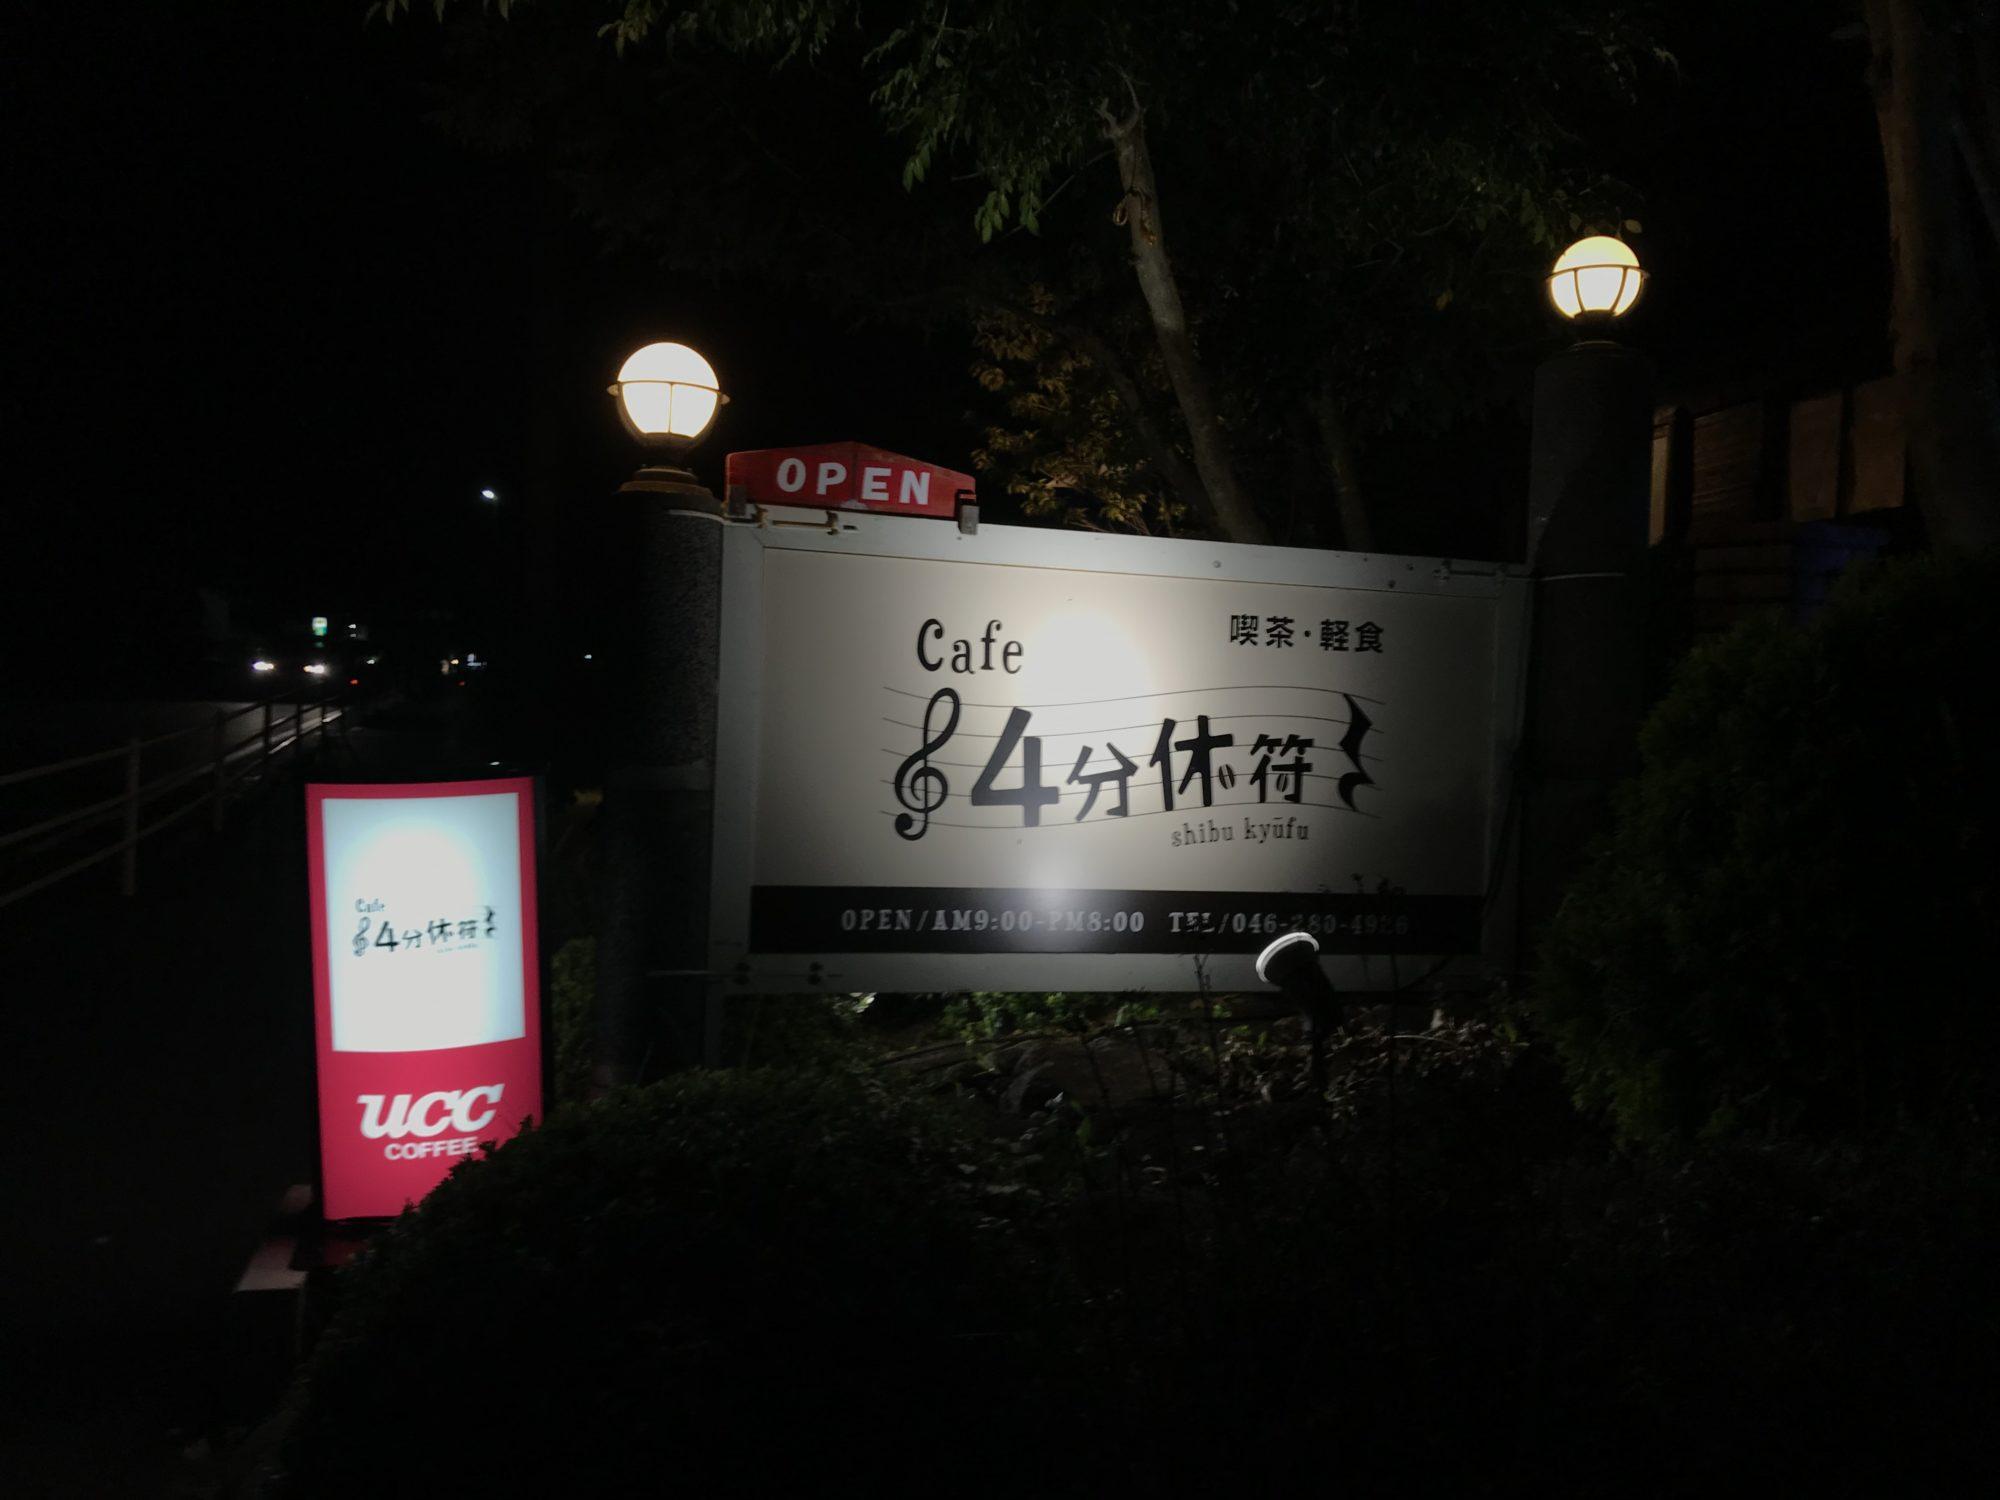 Cafe 4分休符